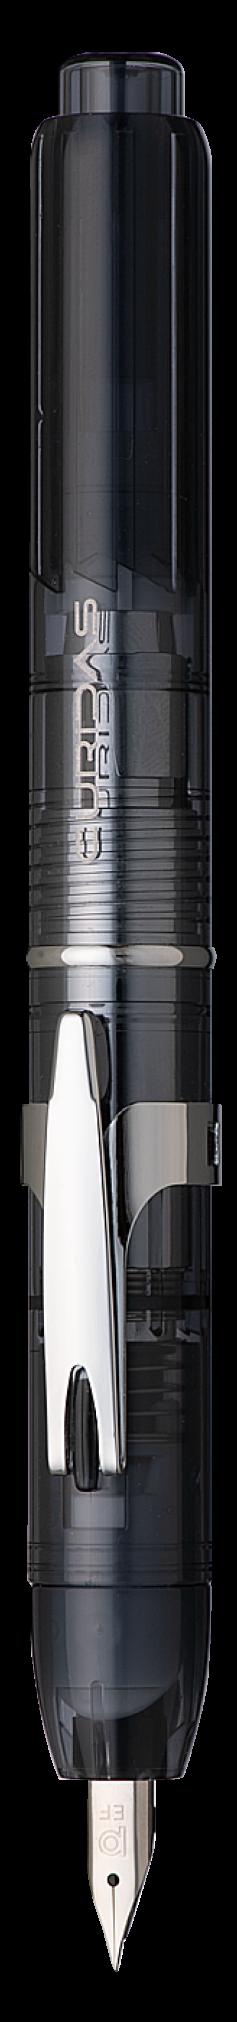 Platinum Curidas - Graphite Smoke